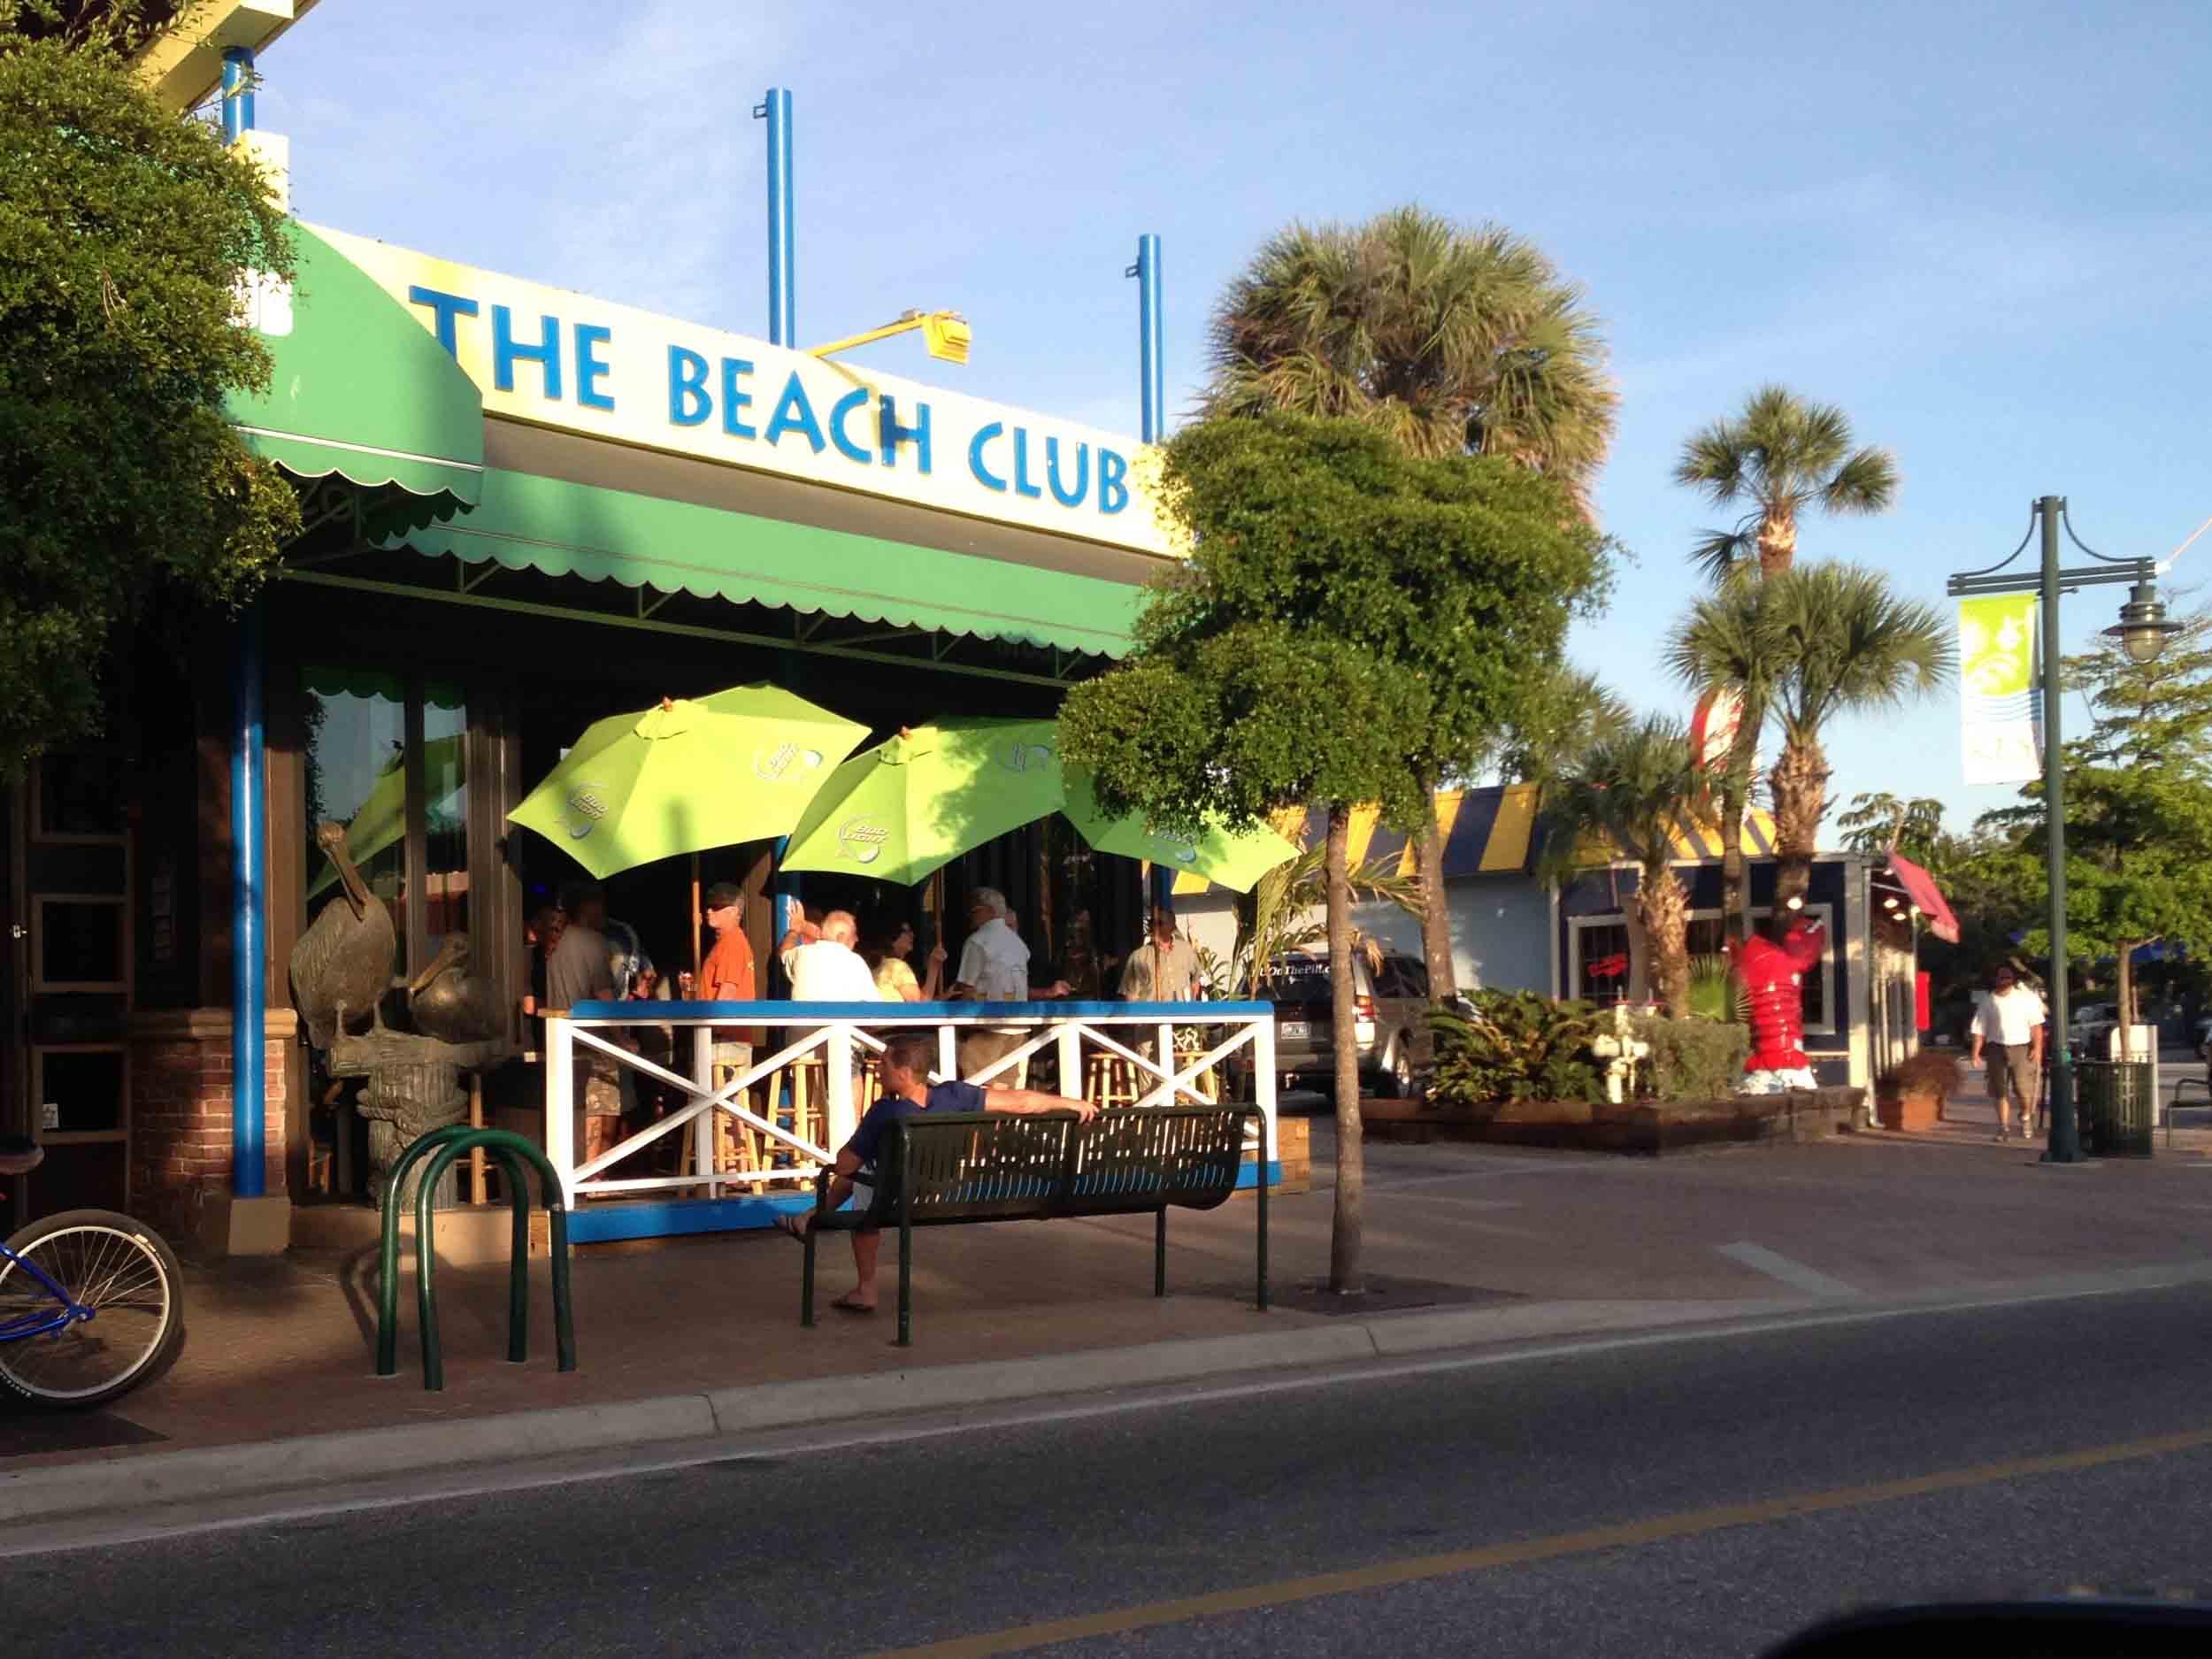 The Beach Club Entrance